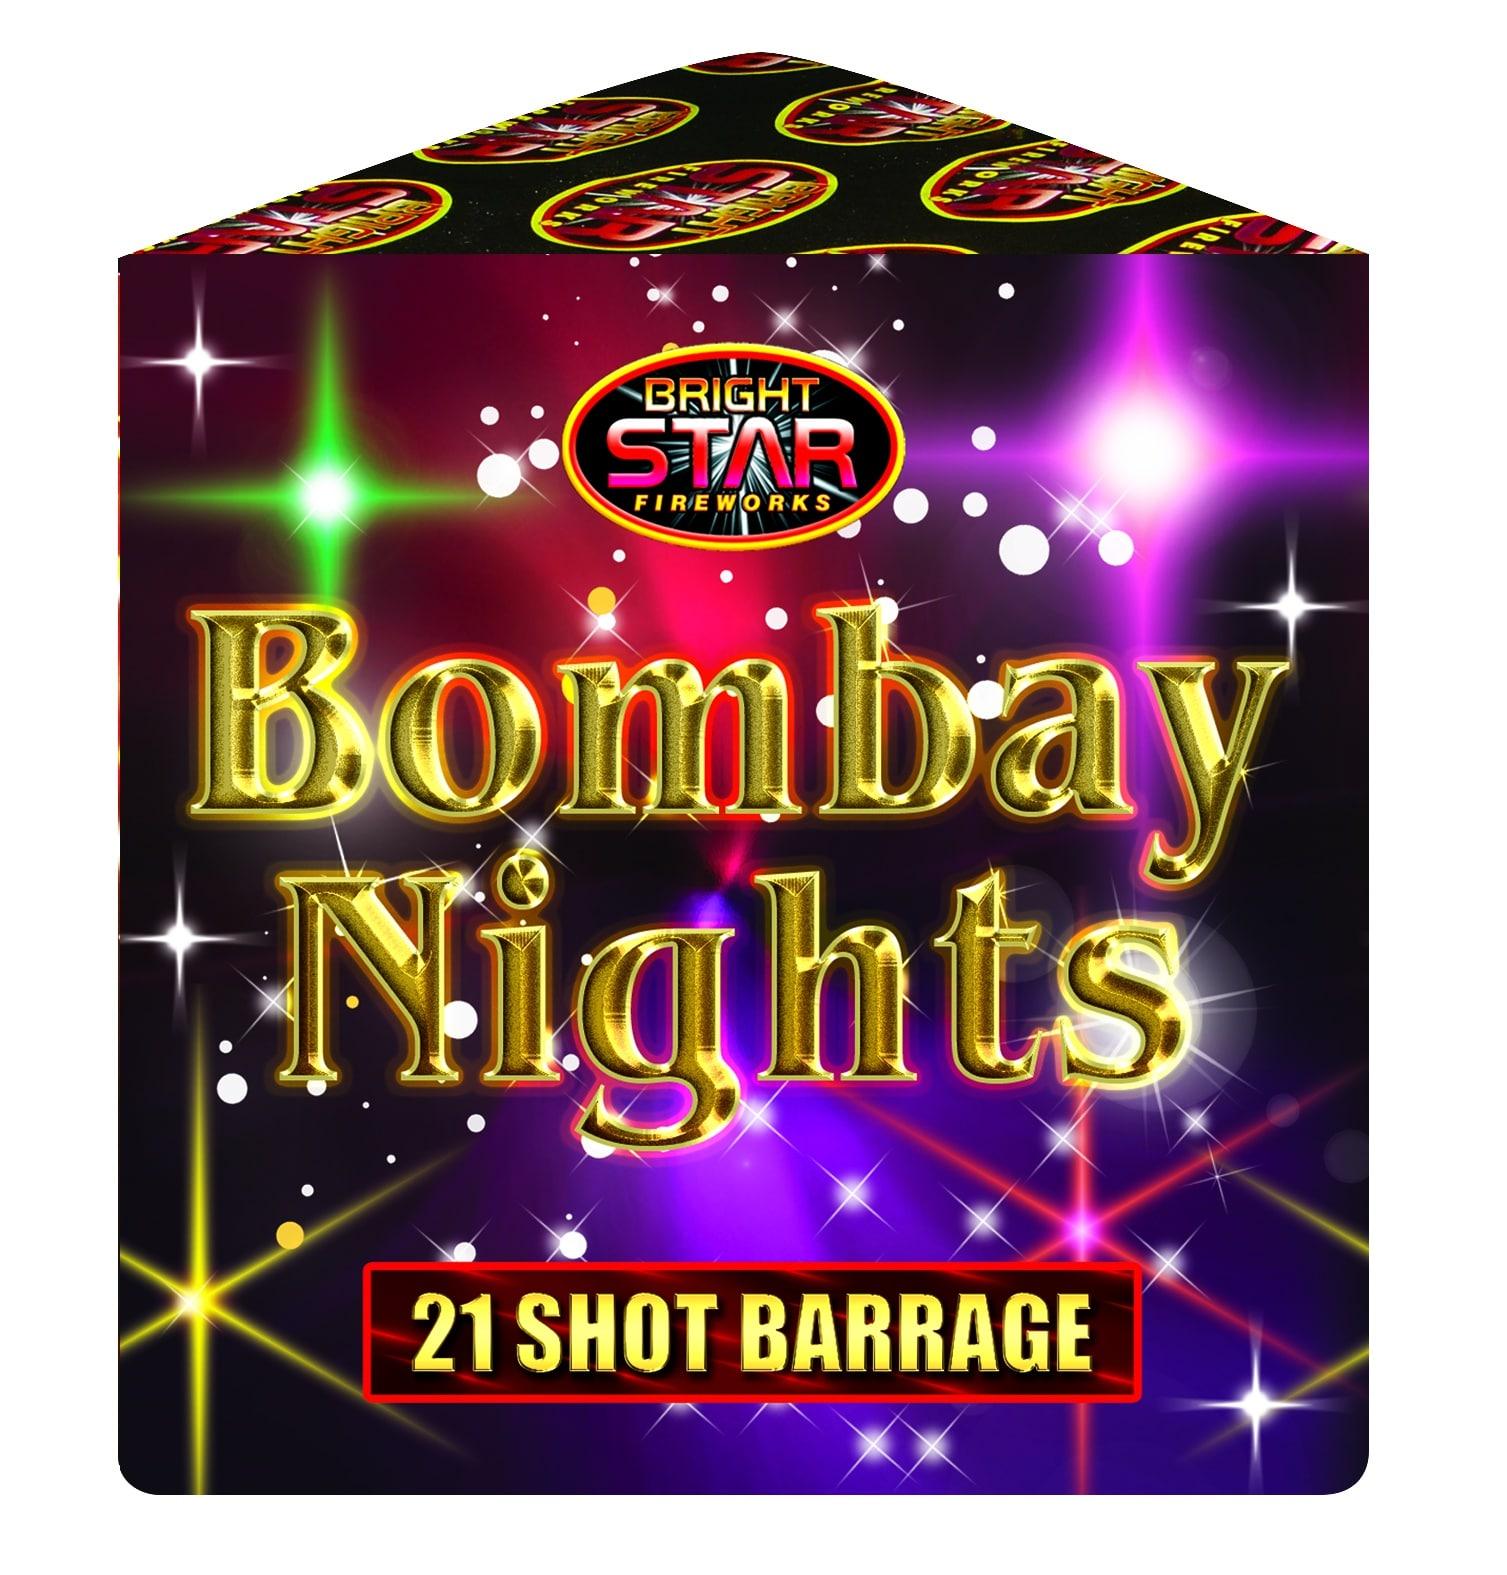 Bombay Nights Image